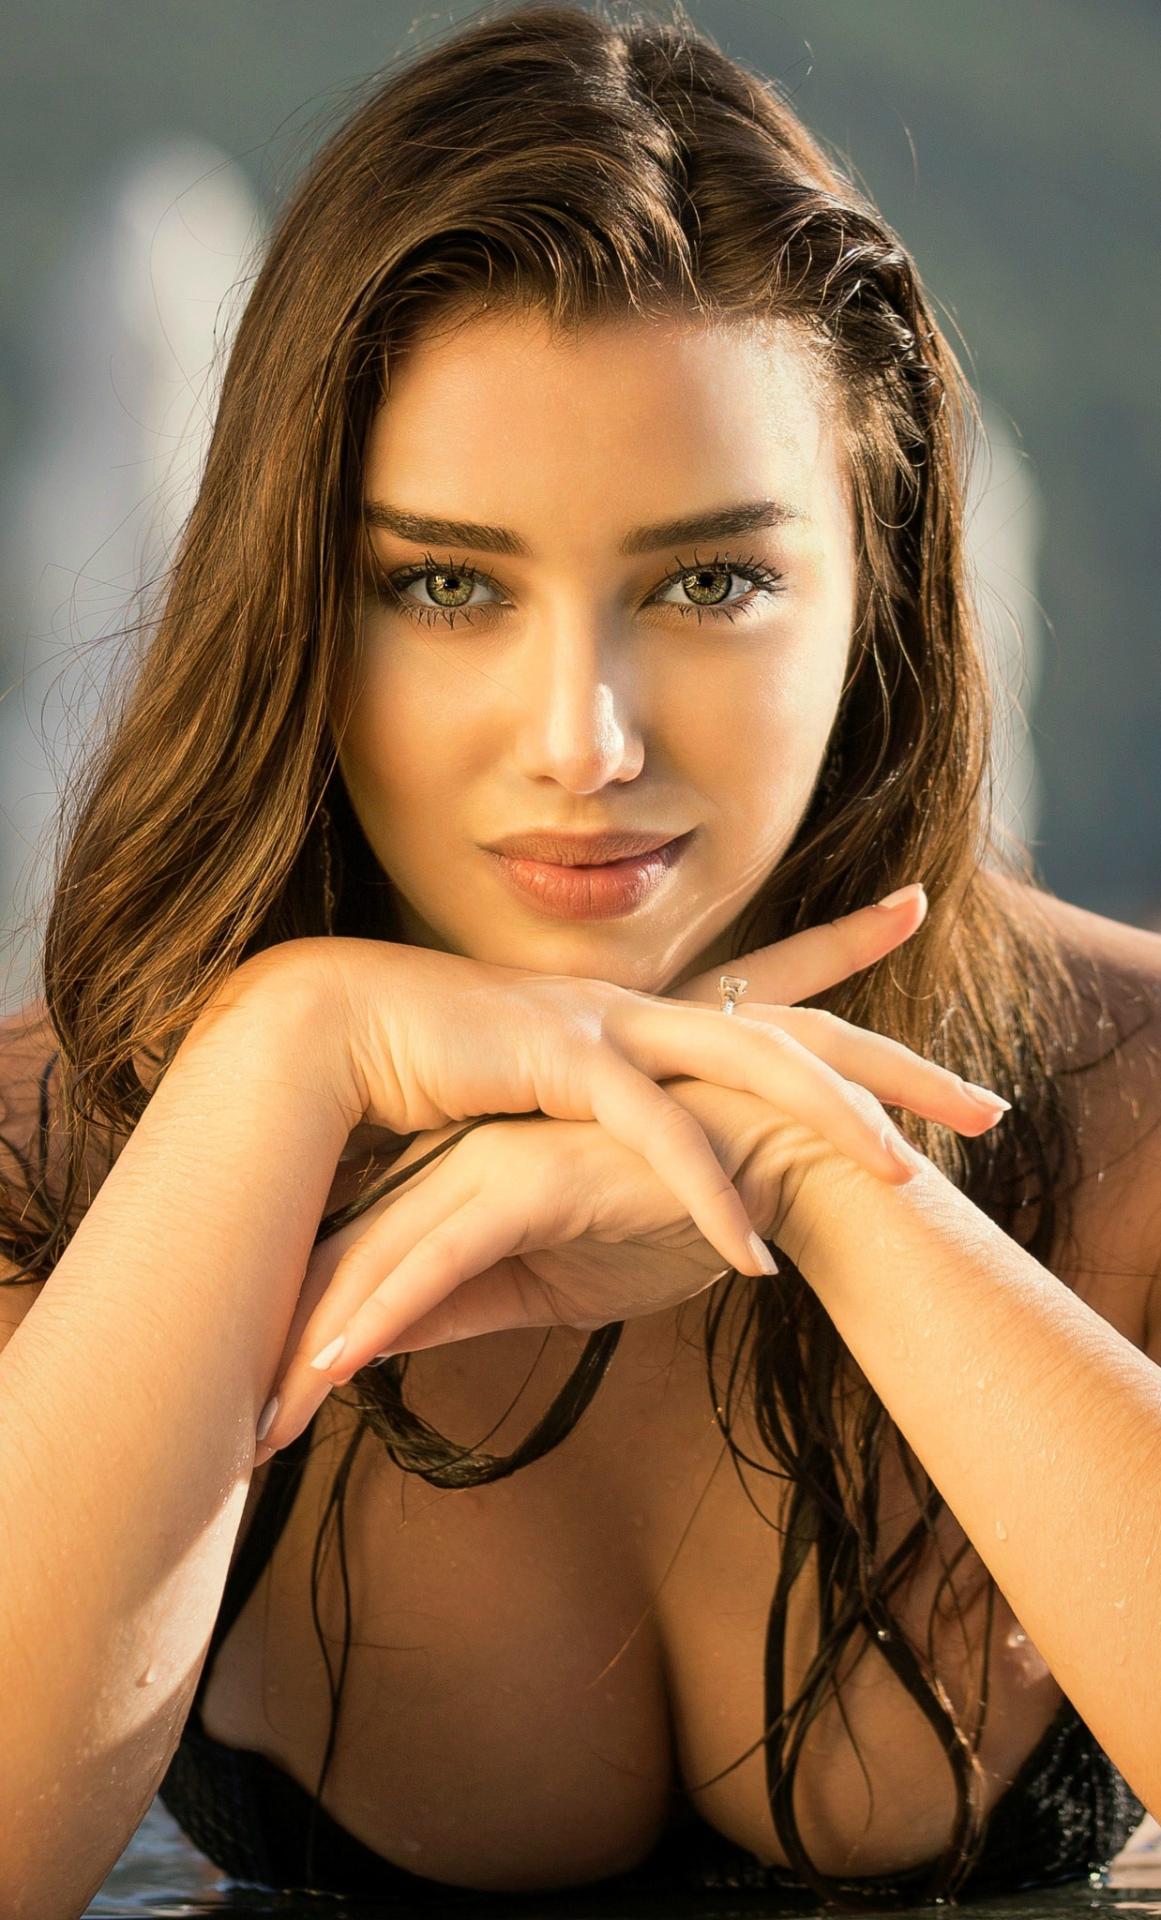 beautyful girl models - photo #1